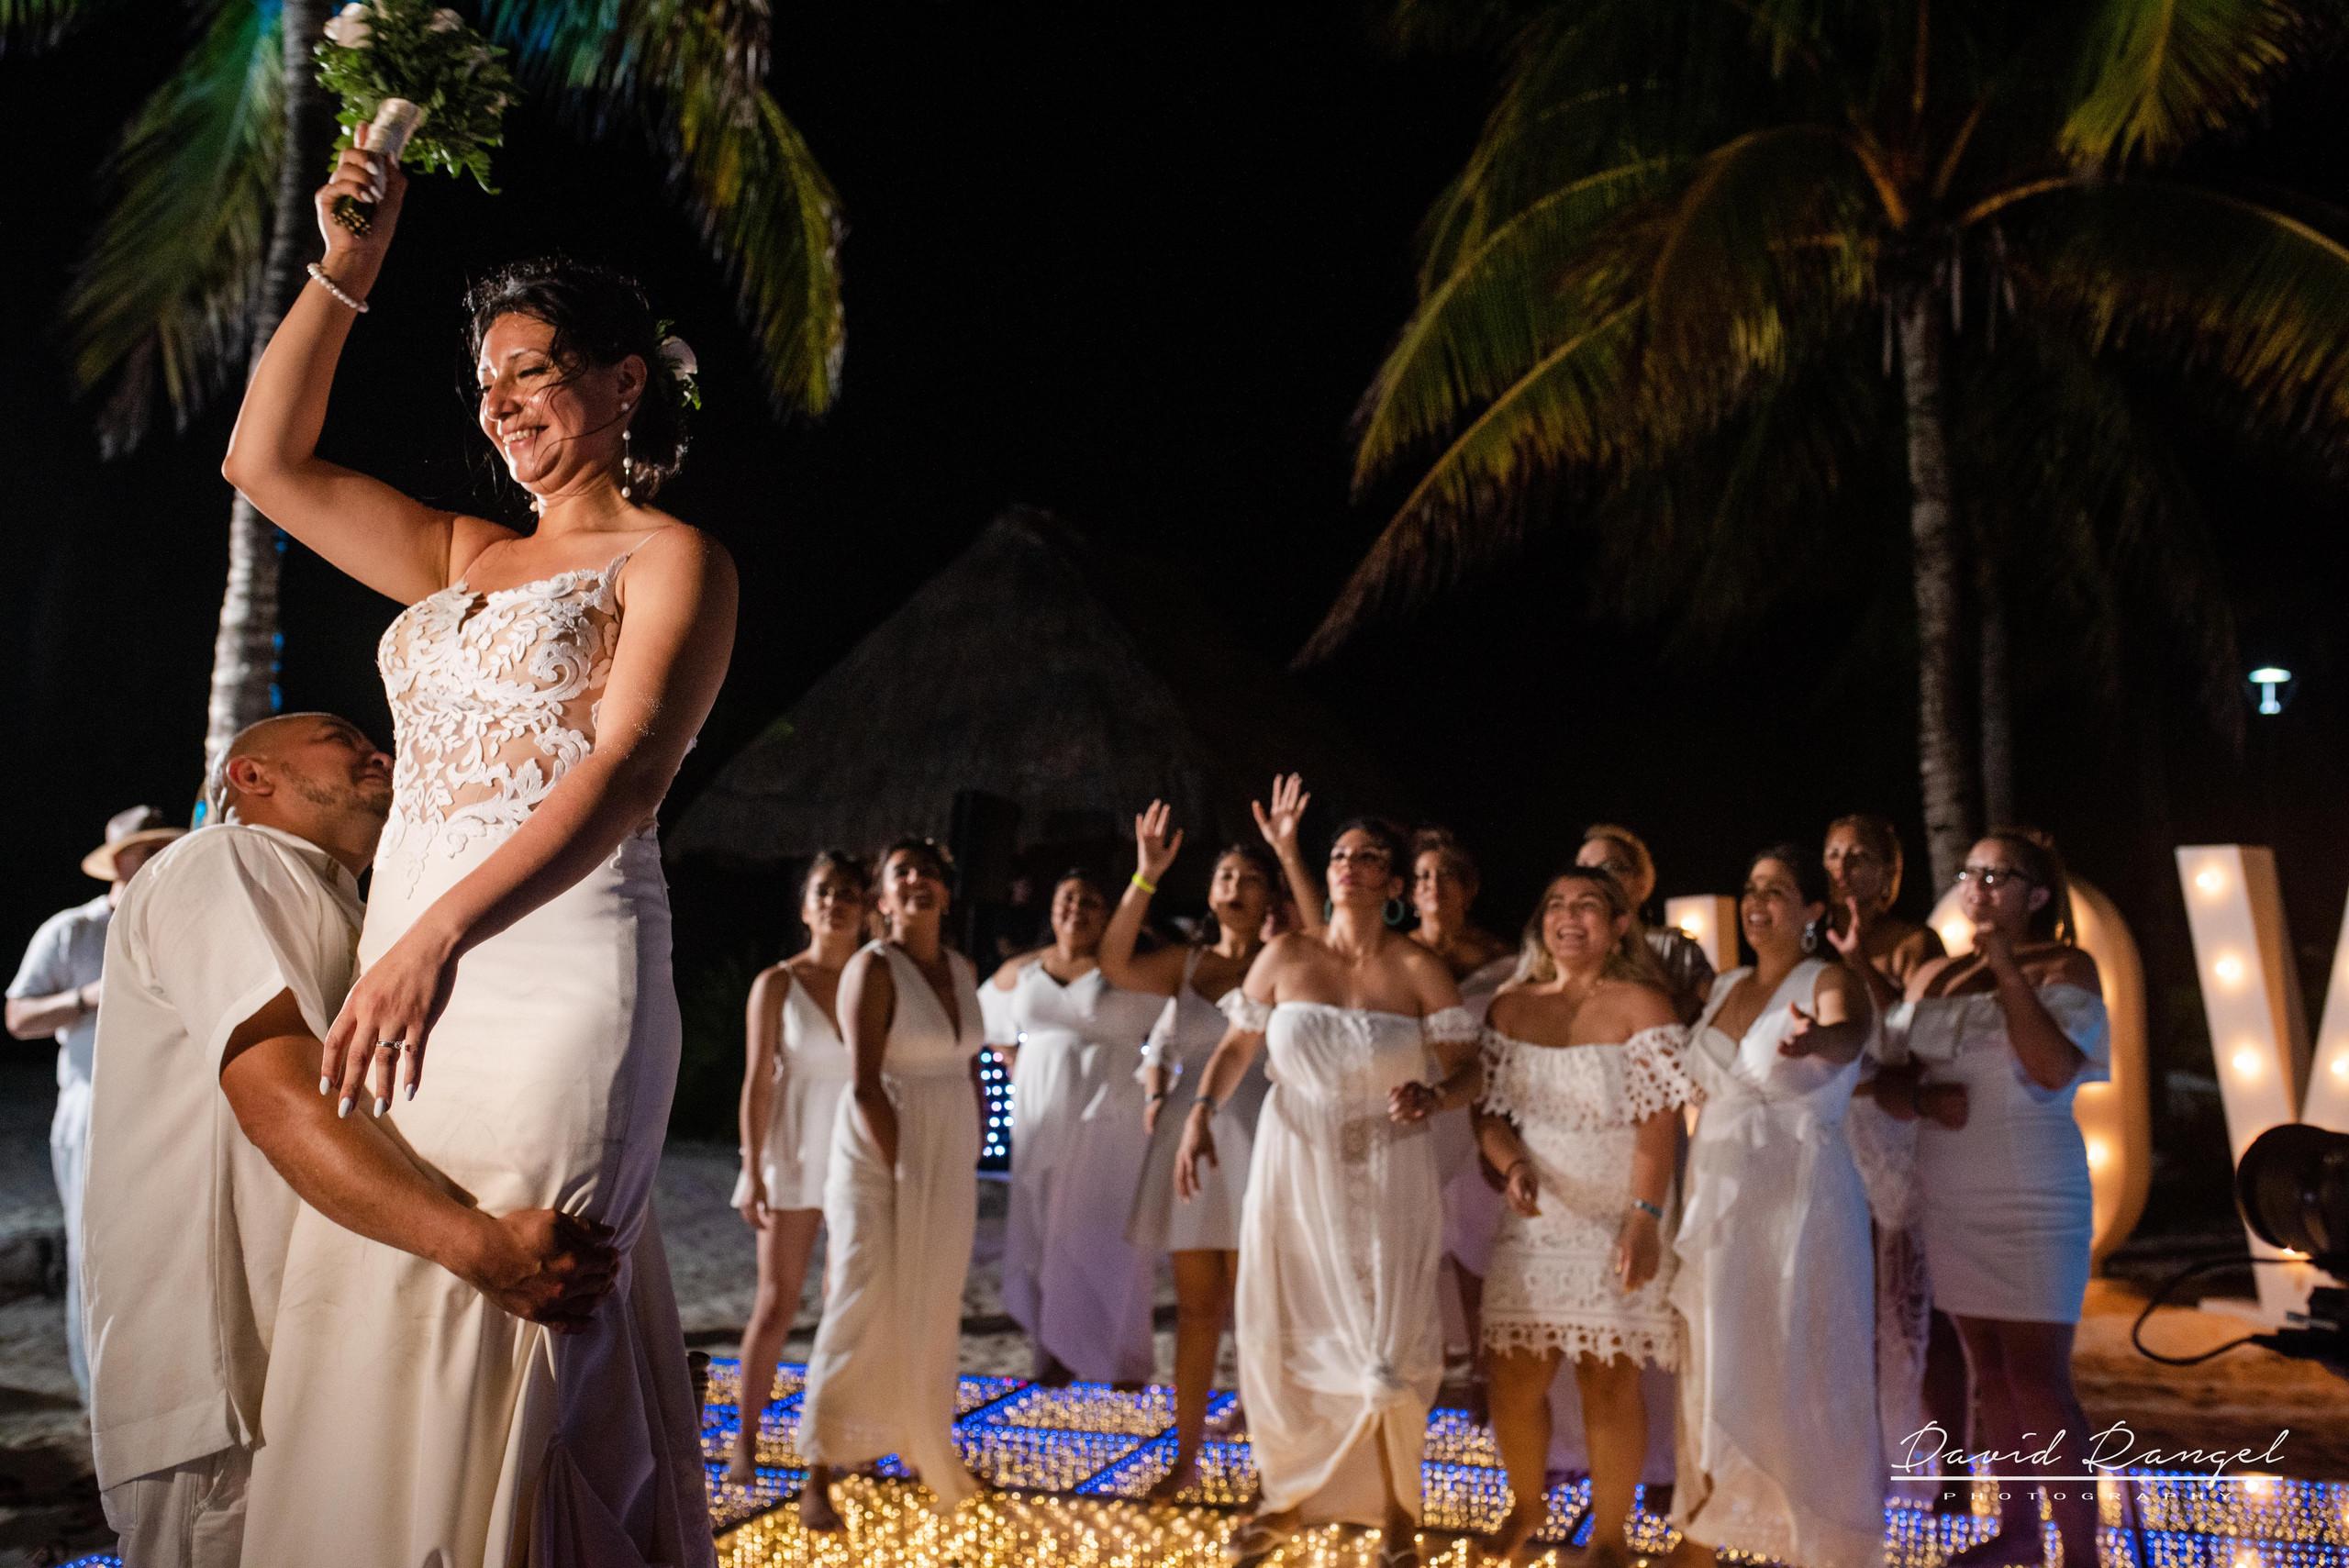 first+dance+occidental+xcaret+venue+dance+floor+bride+groom+love+letters+boquet+toast+girls